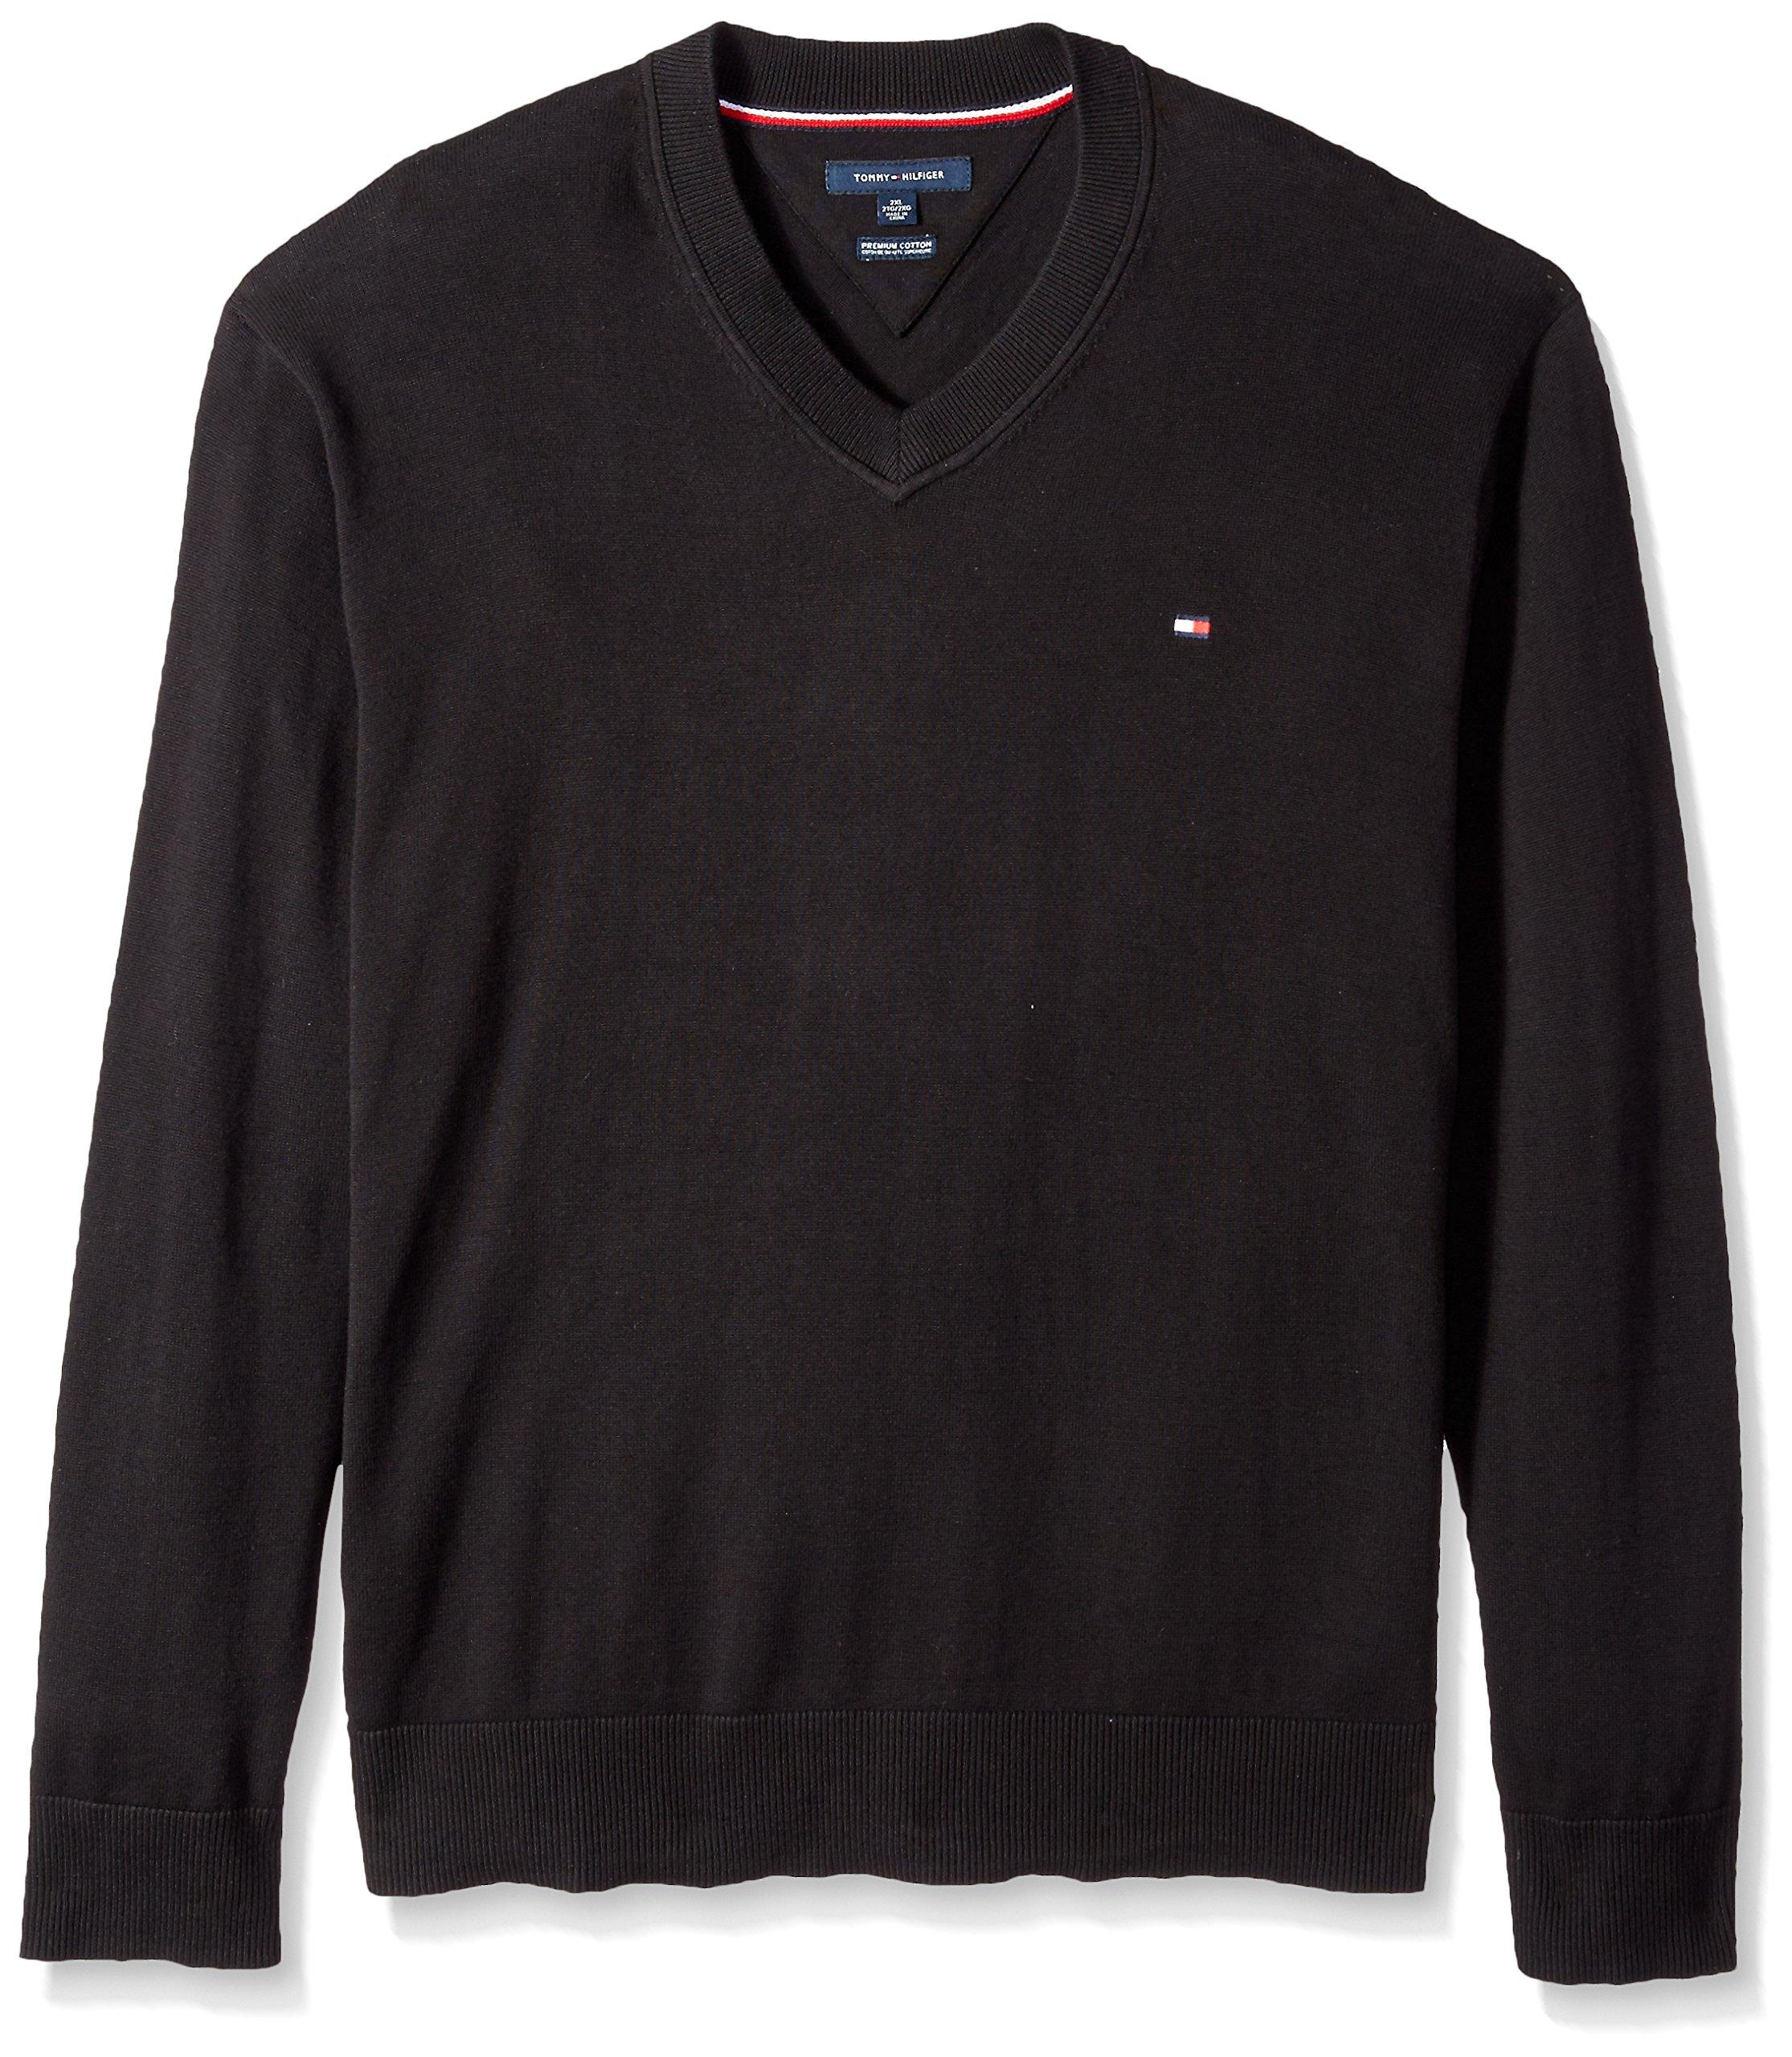 Tommy Hilfiger Men's Big and Tall Sweater Signature Solid V Neck, Deep Knit Black, BG-3XL